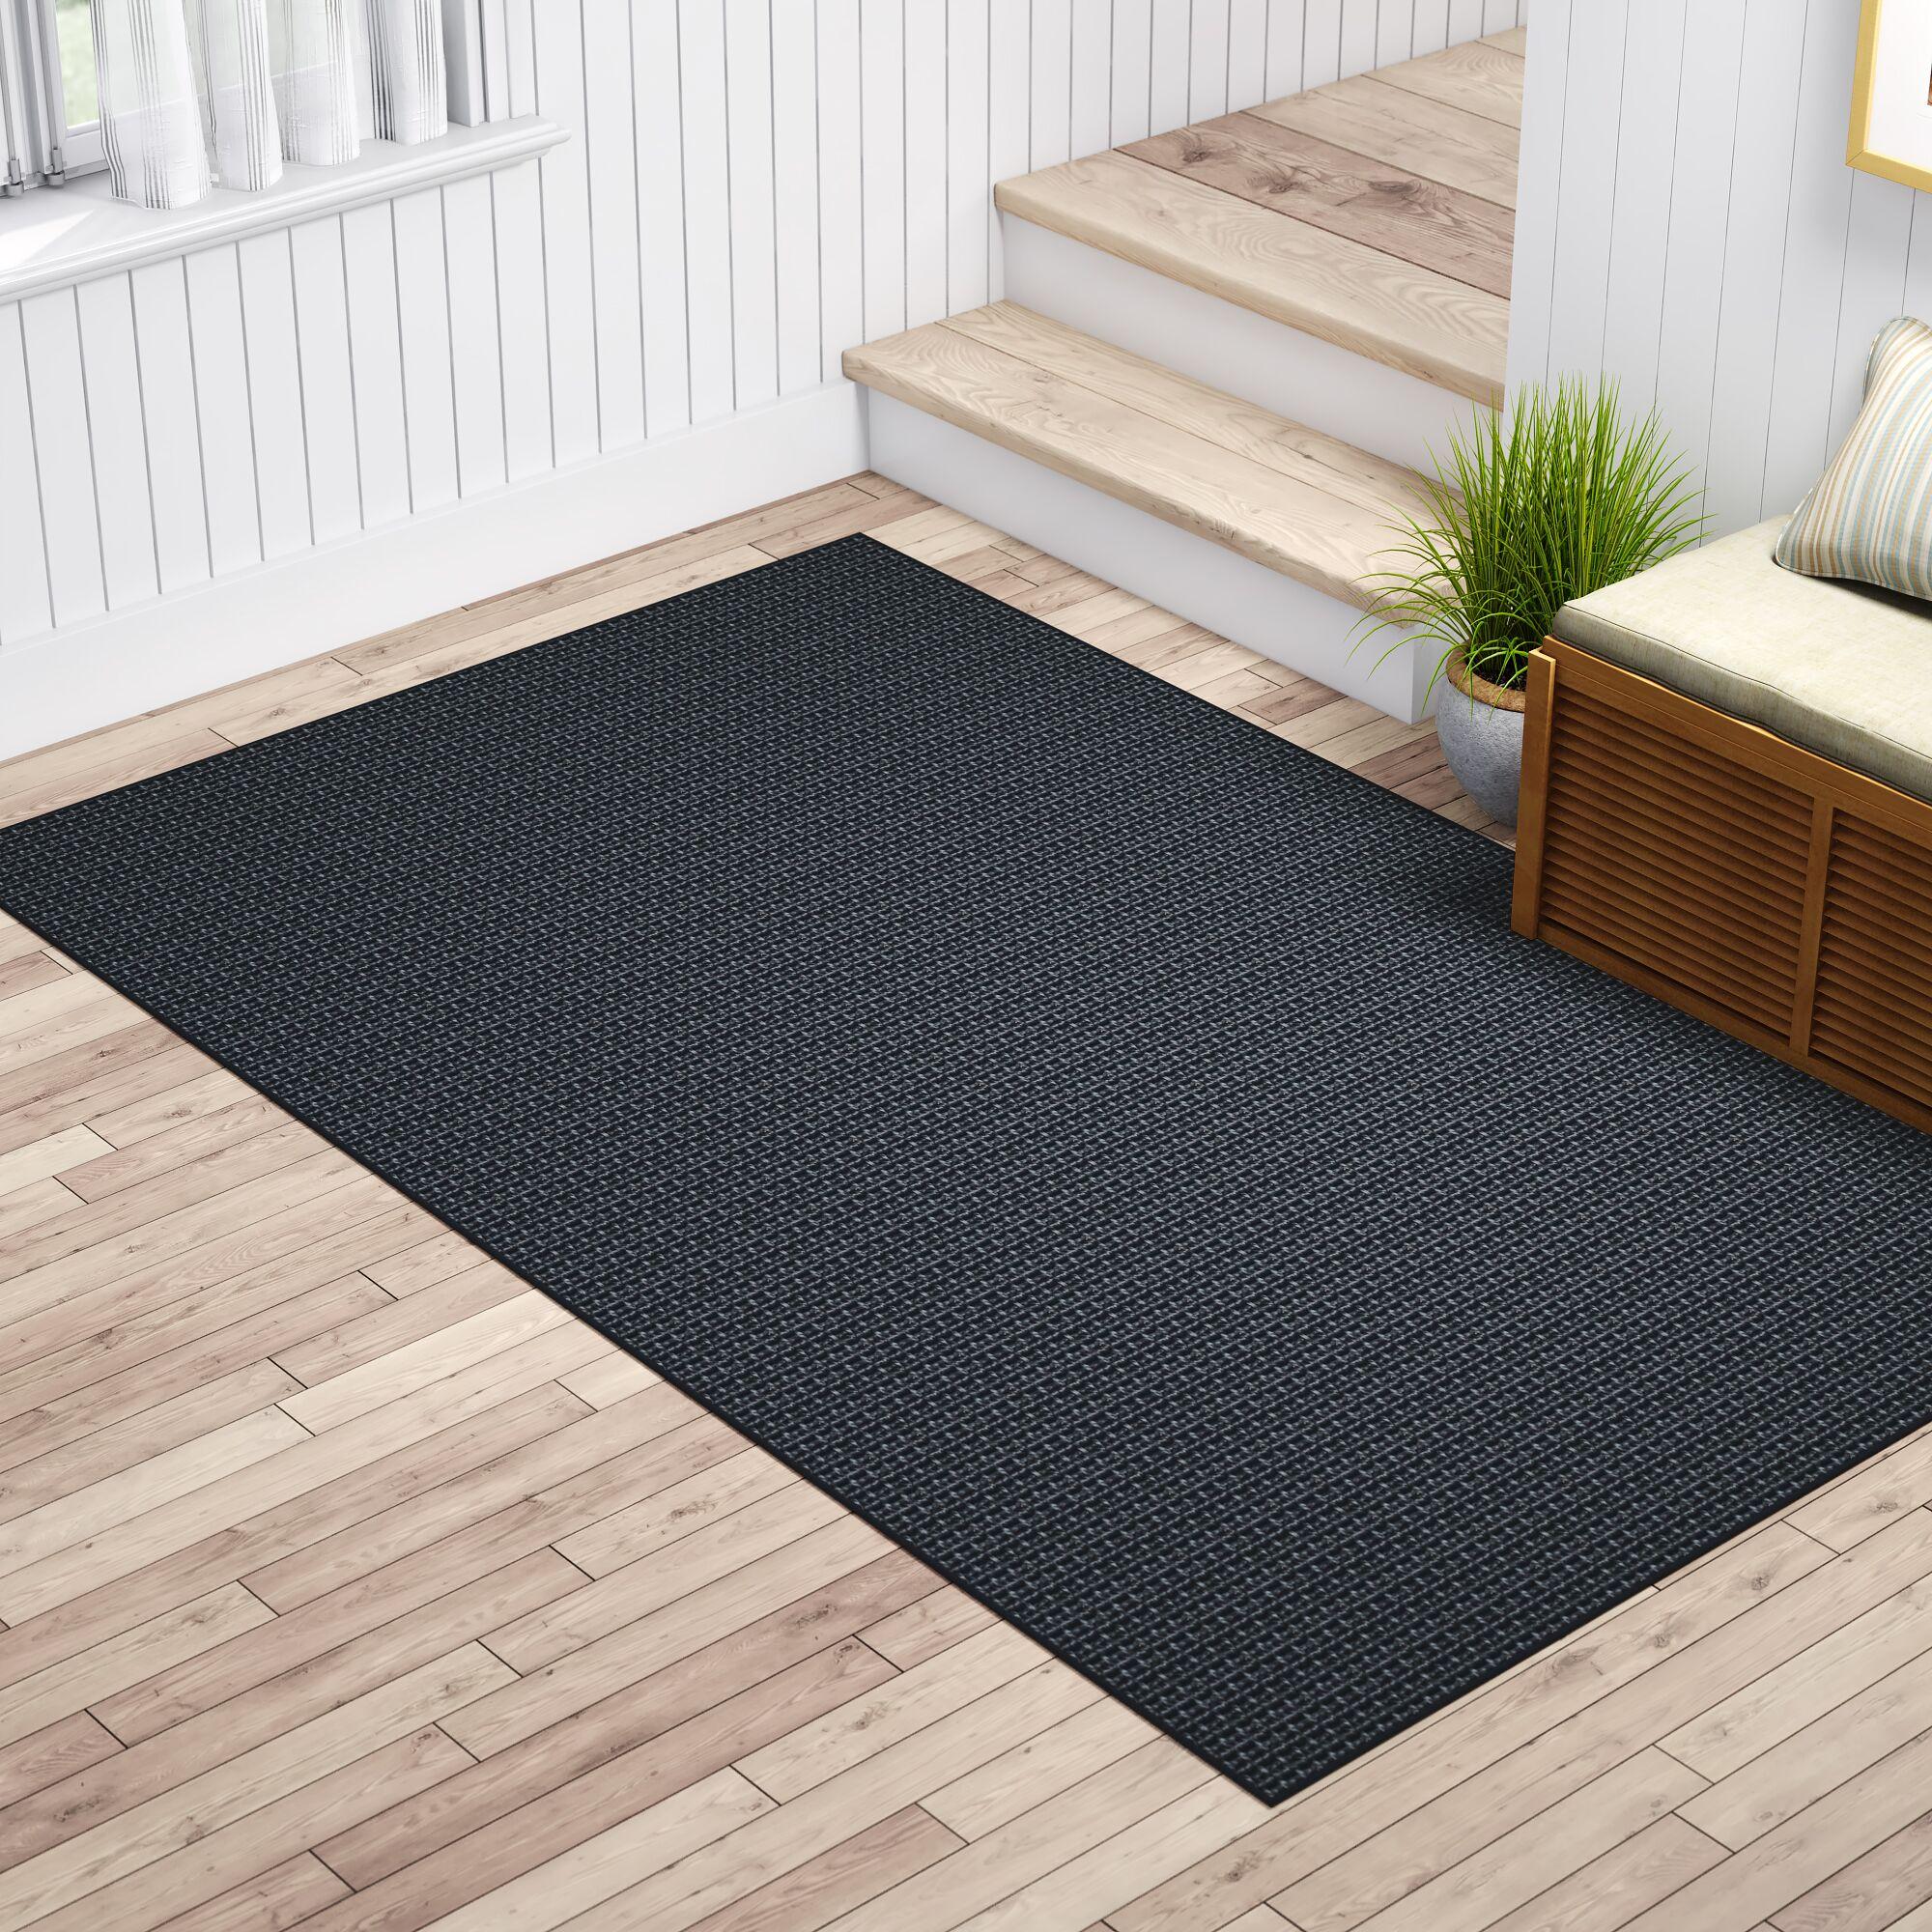 Waverly Black Area Rug Rug Size: 8' x 10'